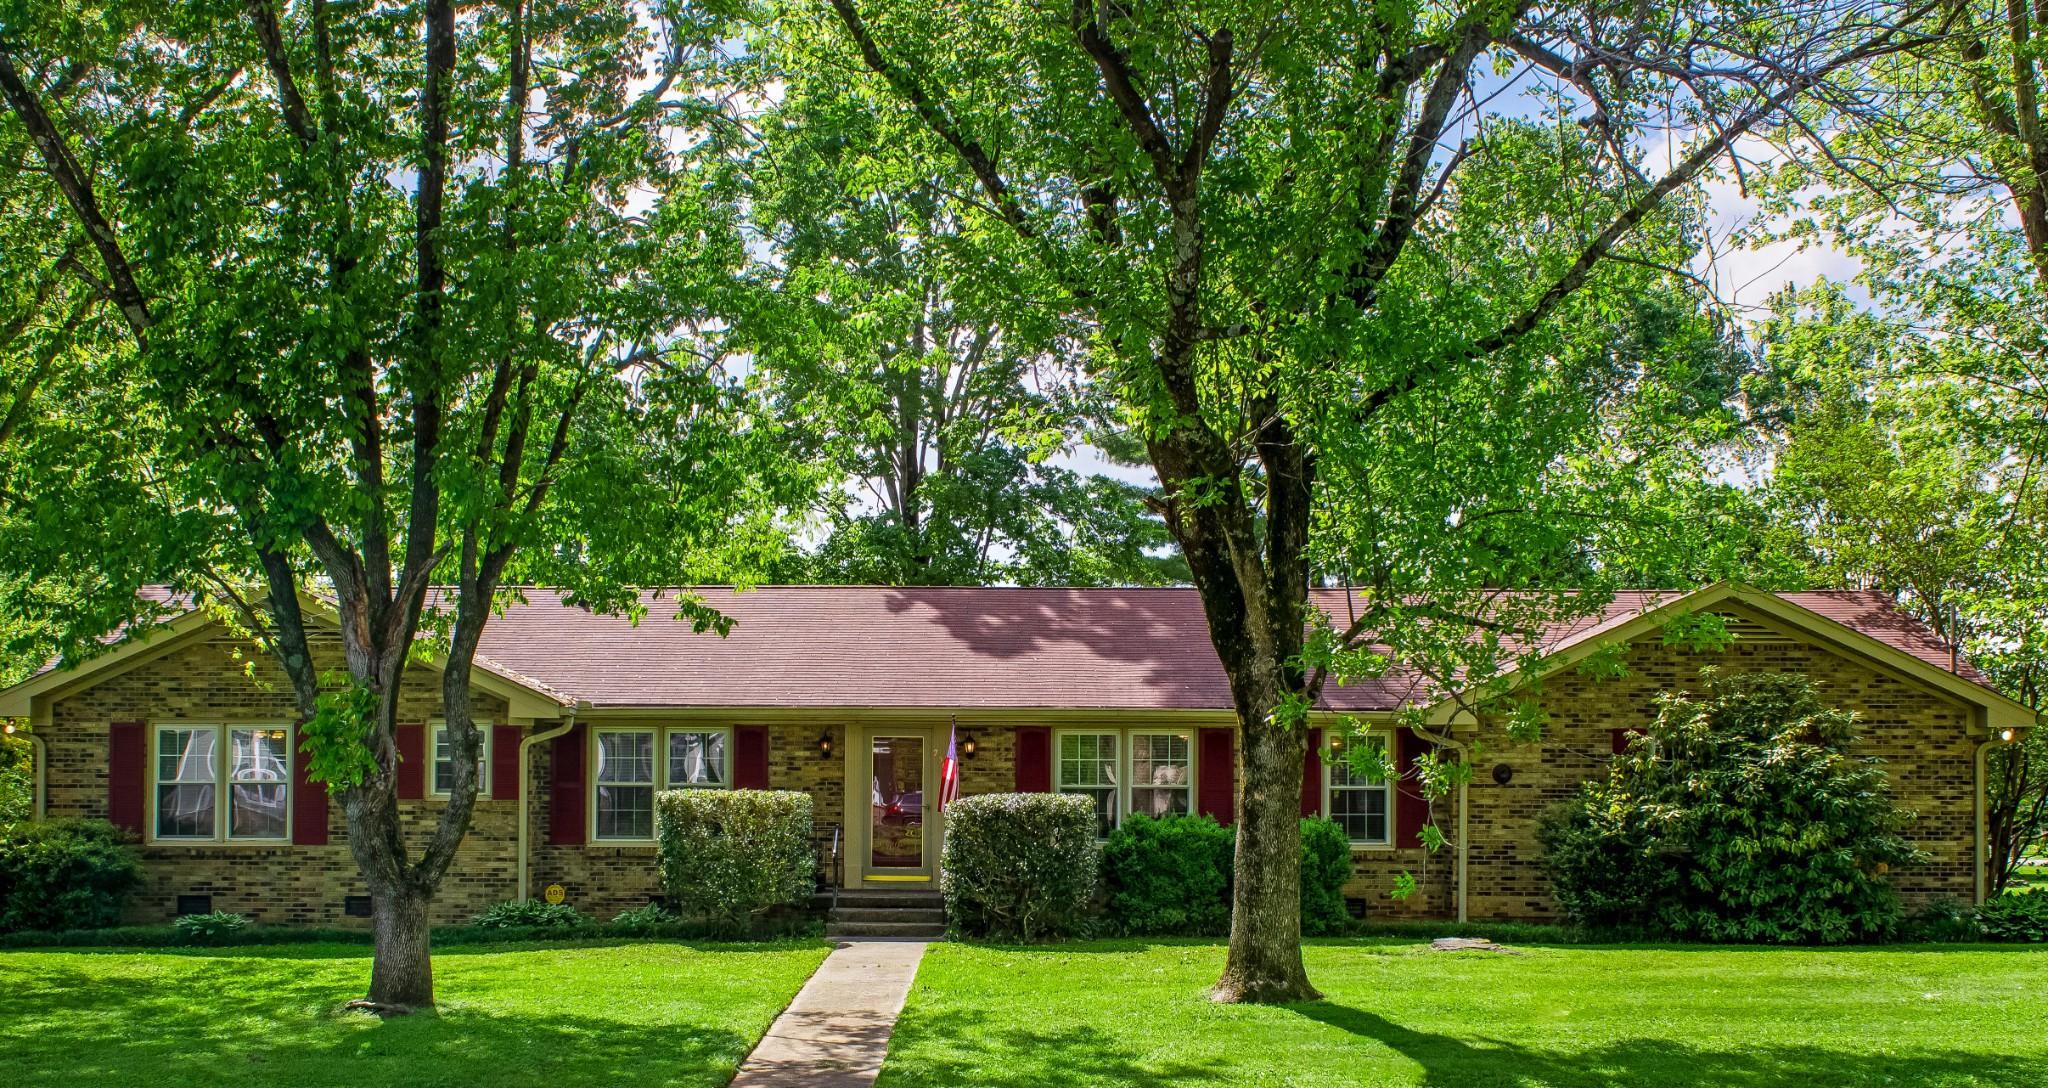 2507 Gilbert St Property Photo - Murfreesboro, TN real estate listing